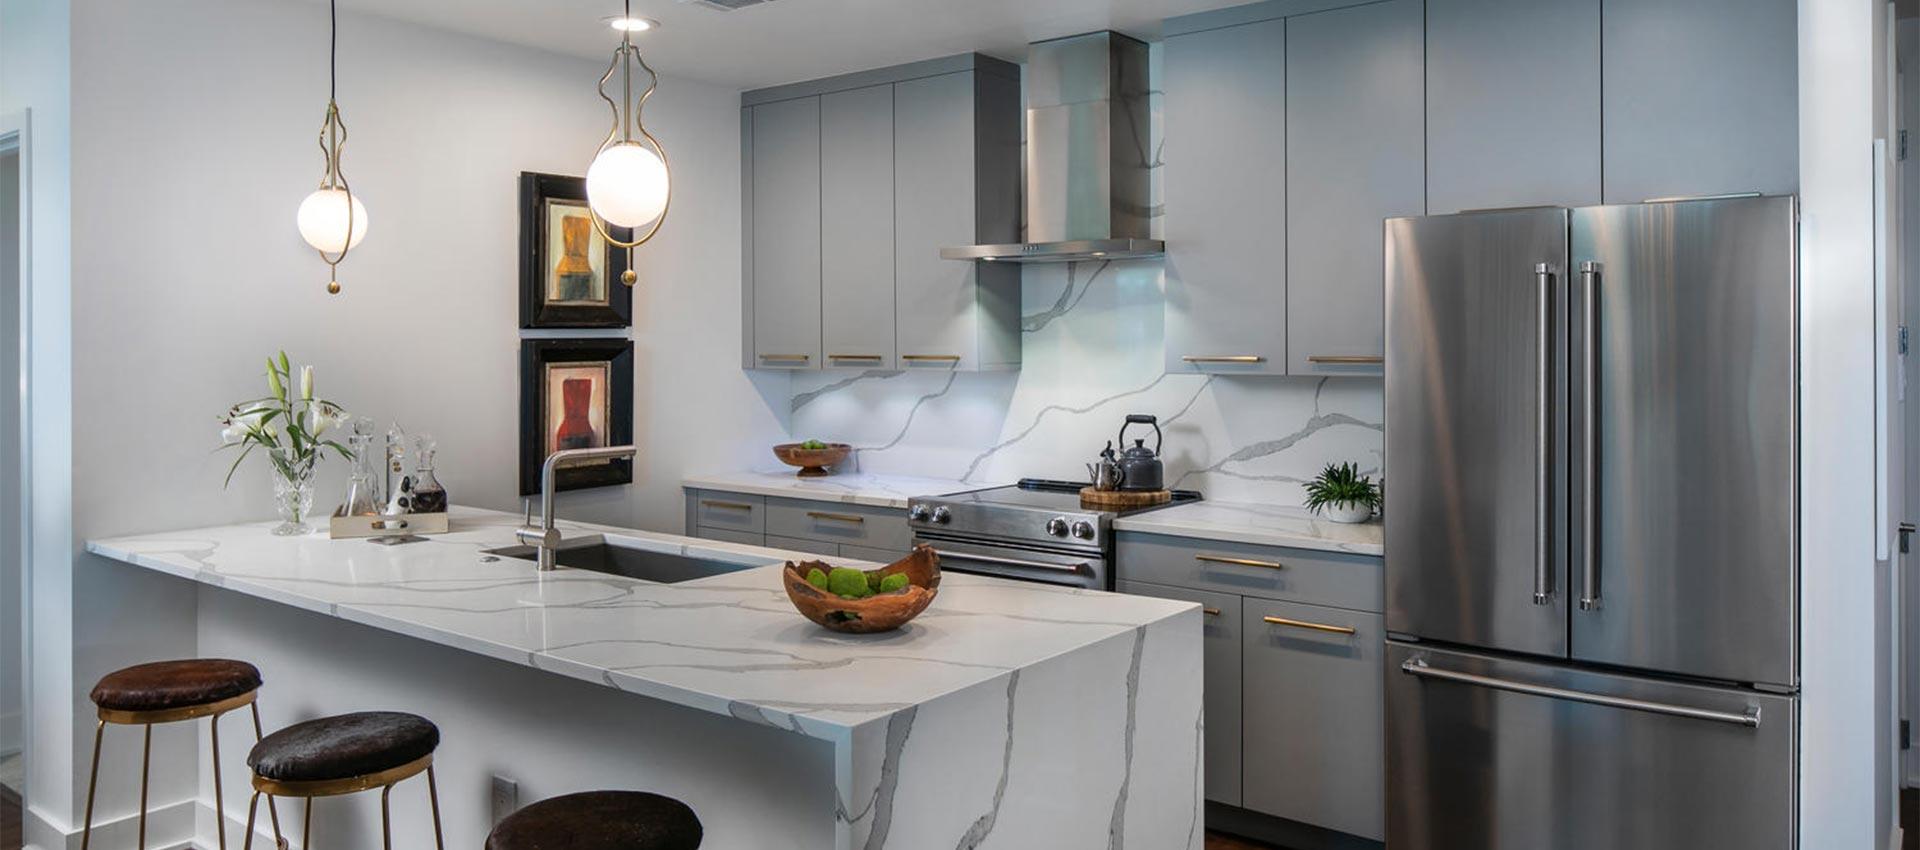 schlabachwooddesign amish kitchen cabinets Schlabach Wood Design has quality custom built cabinets